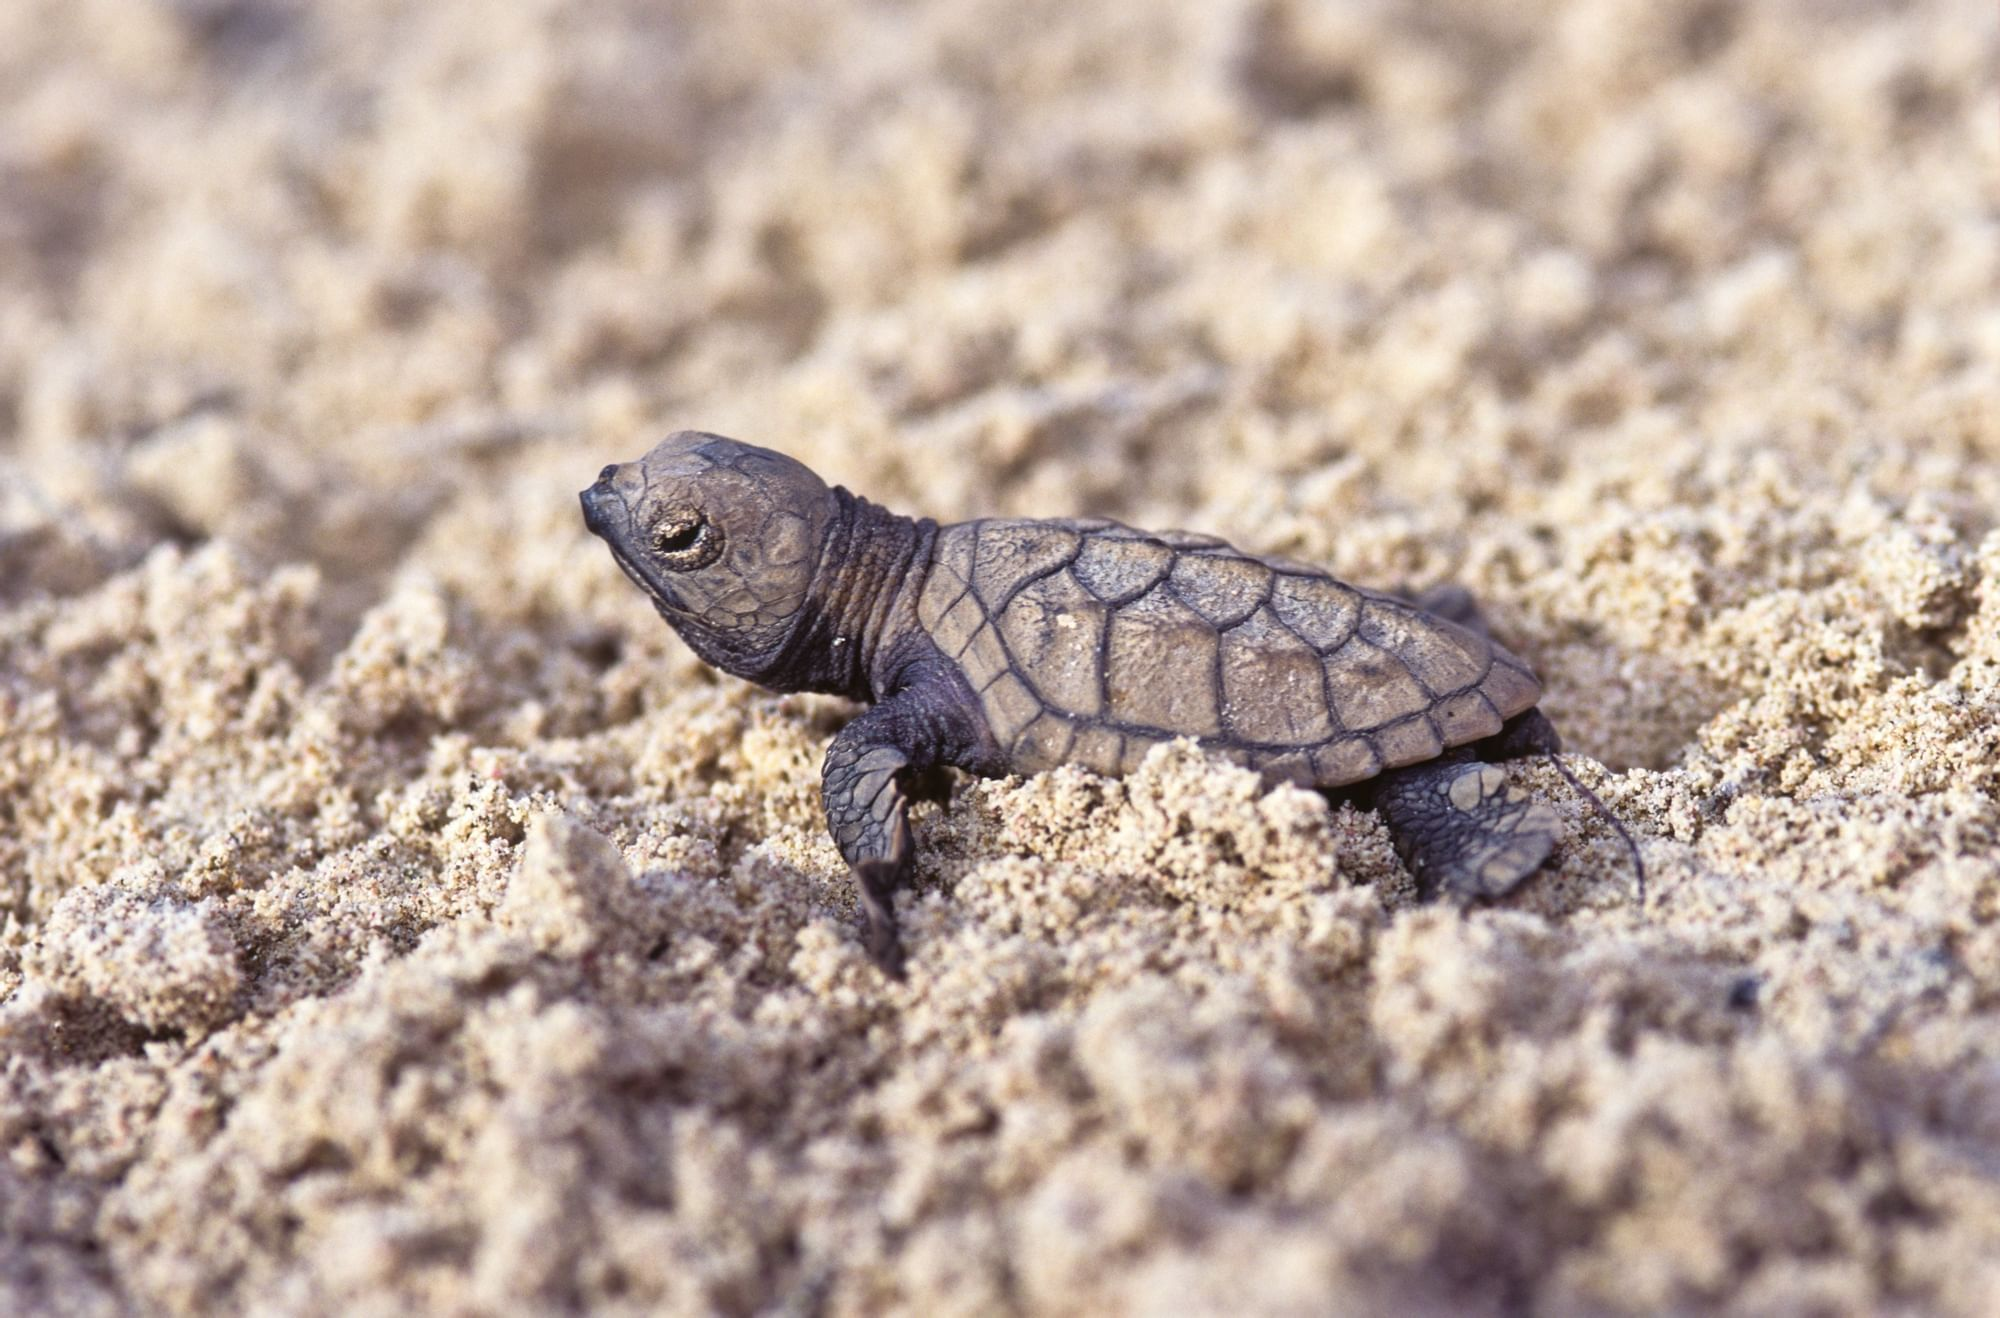 Hawksbill sea turtle hatching on the beach